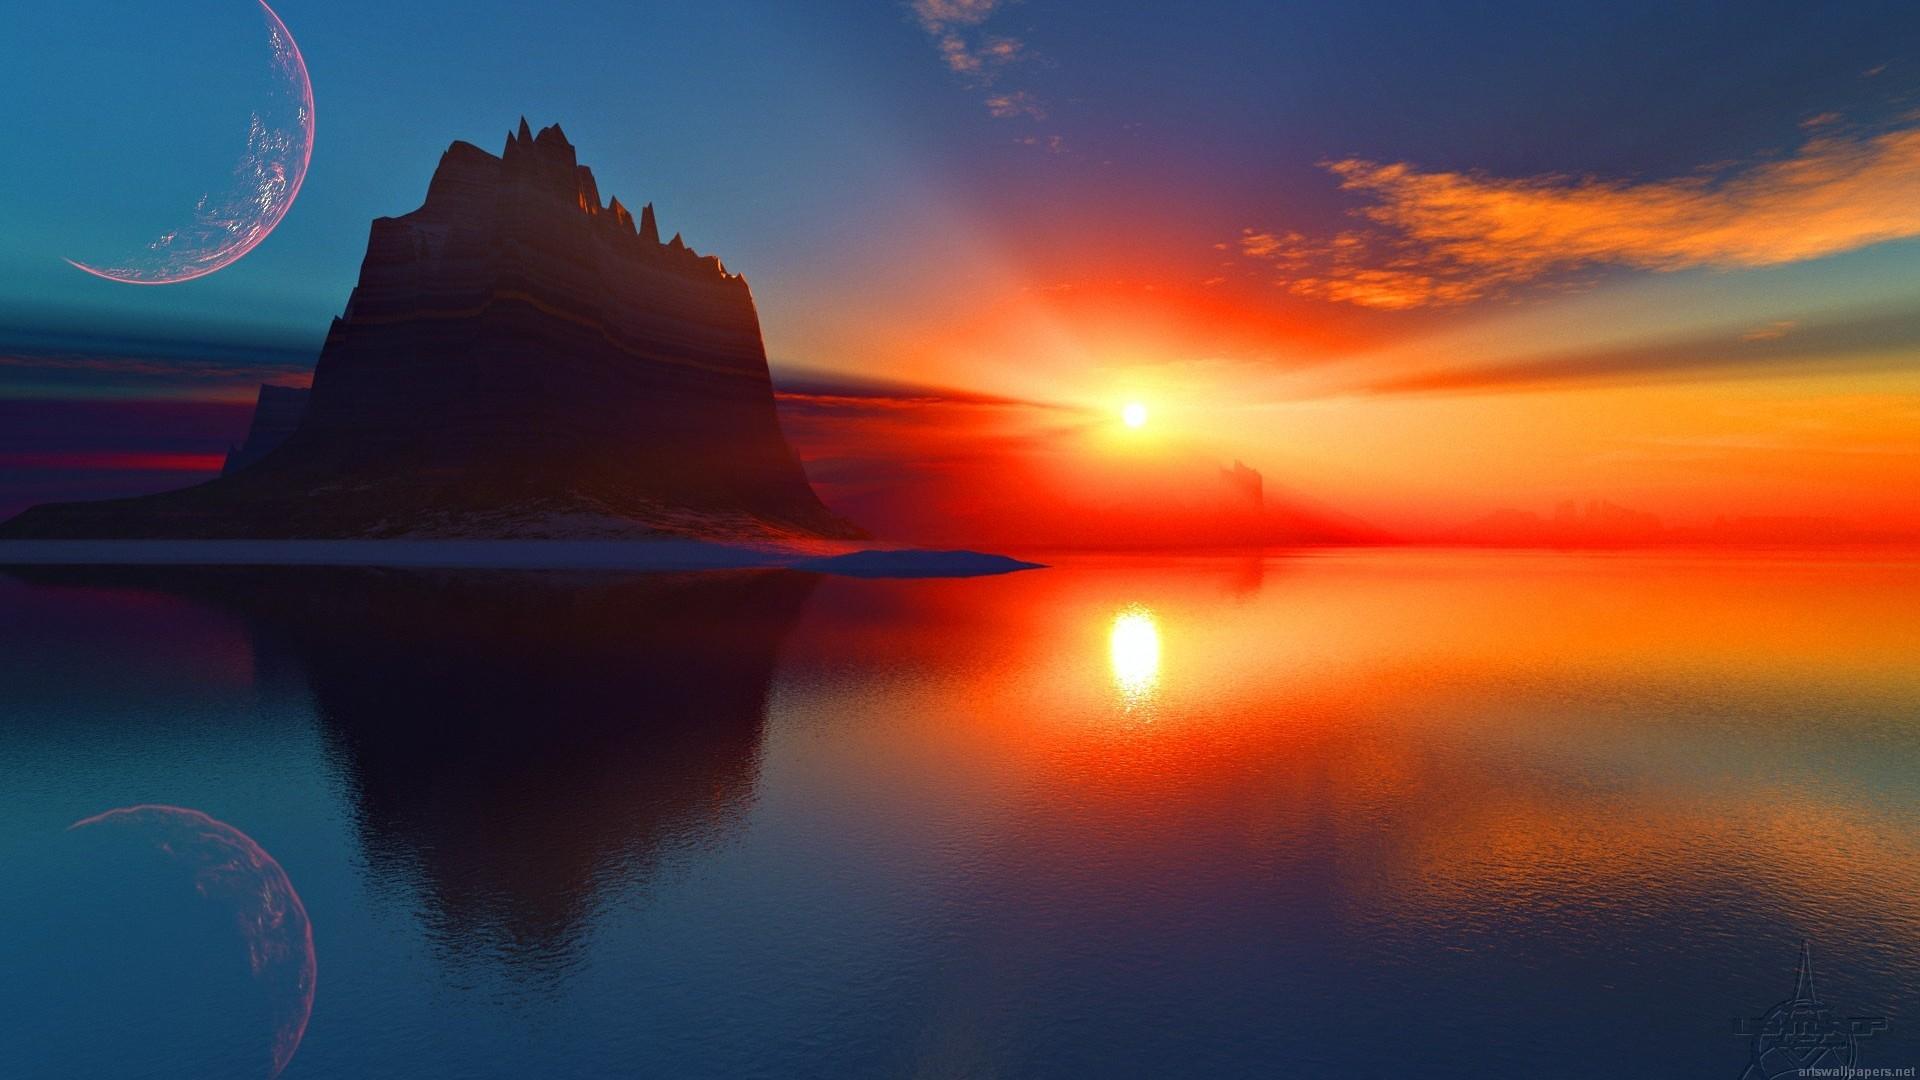 Sunset Desktop Background Hd 78092 Hd Wallpaper Backgrounds Download